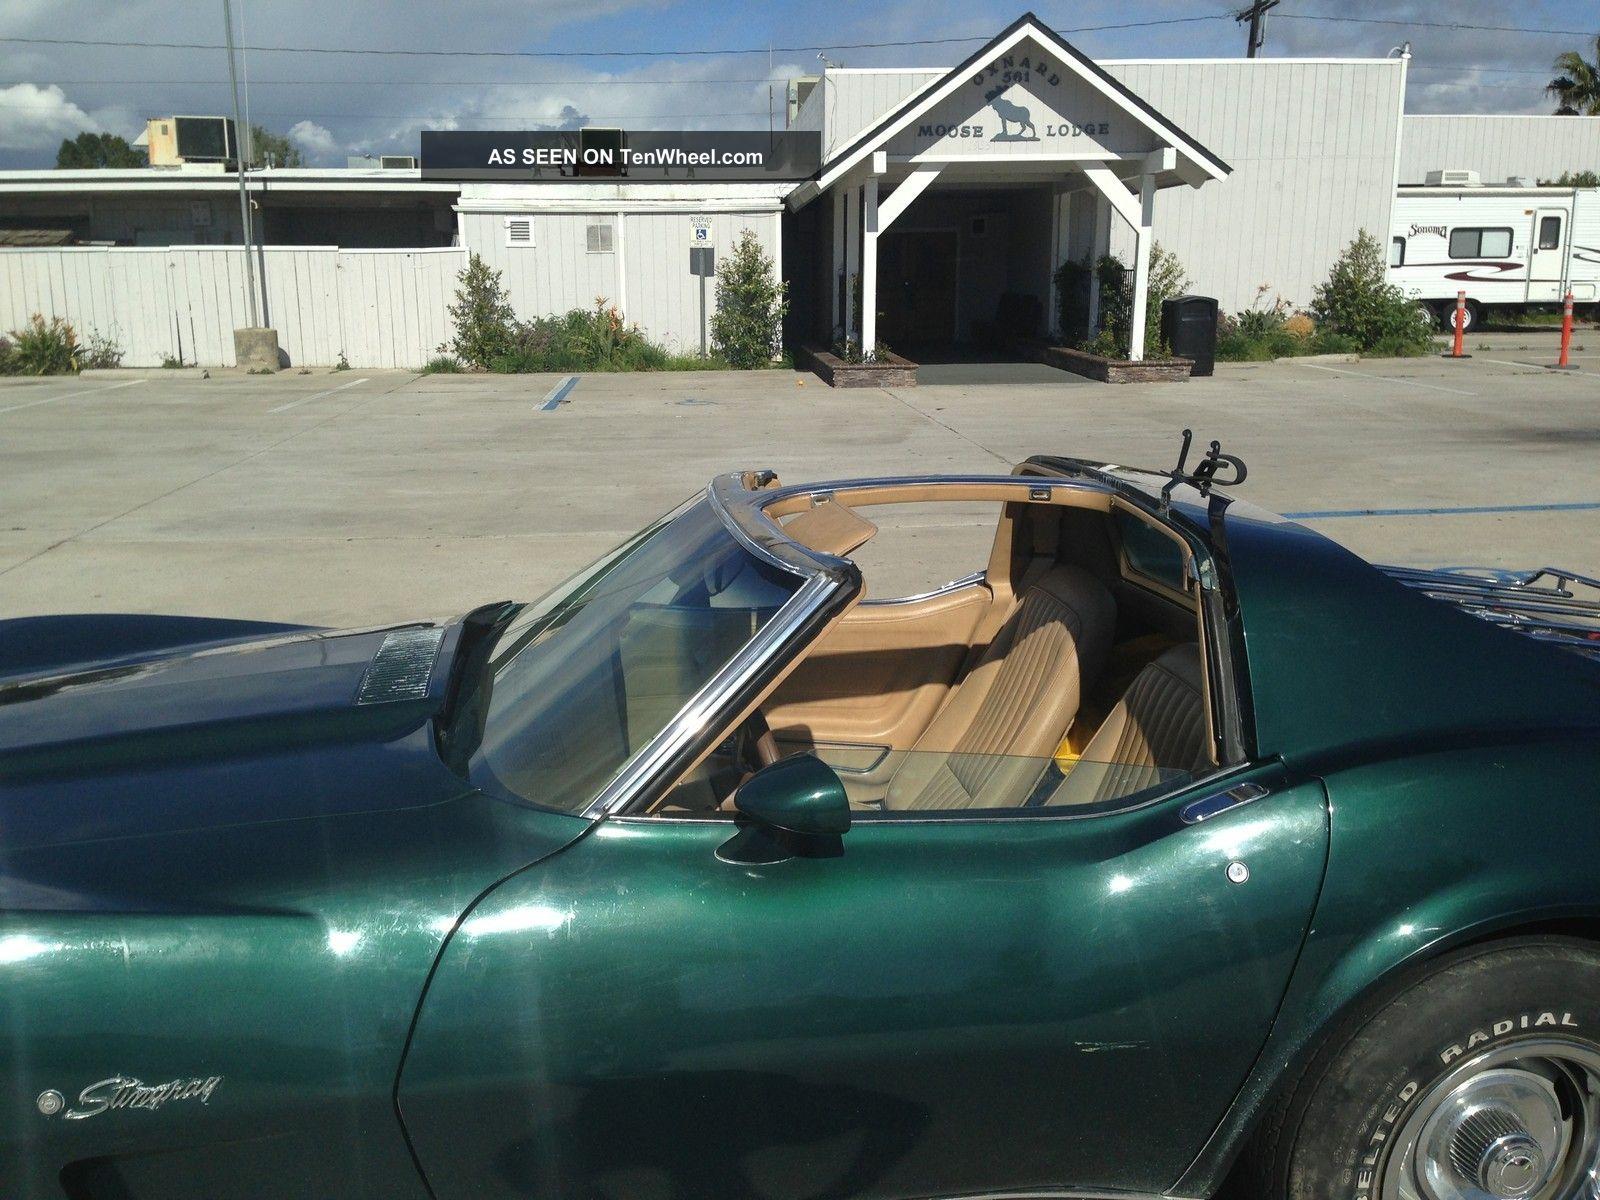 1976 Corvette Stingray T Top Dark Green With Buckskin